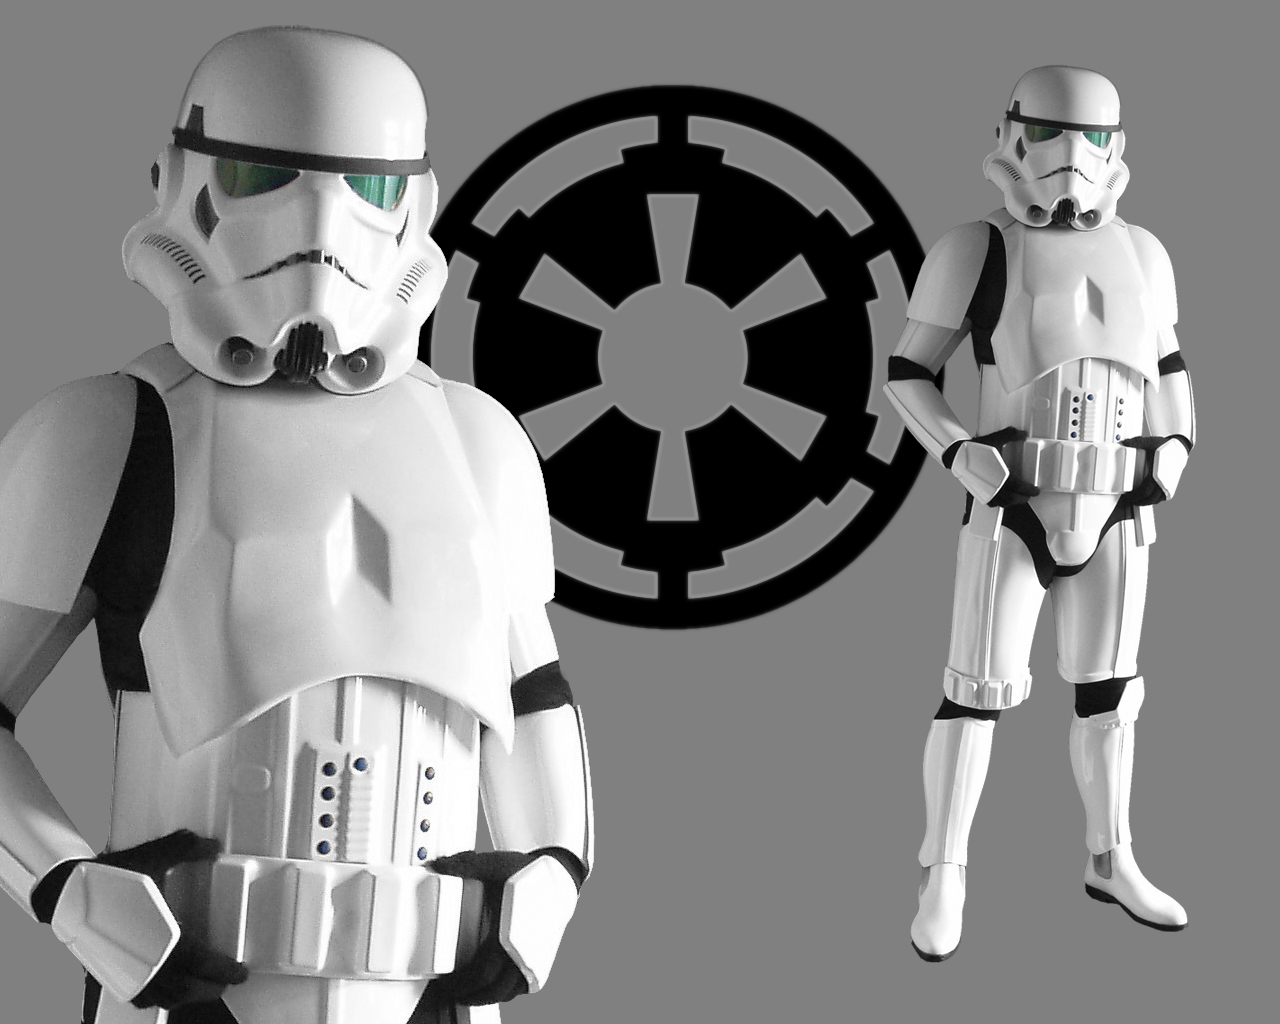 501st stormtrooper costume by obihahn on deviantart - Stormtrooper suit wallpaper ...